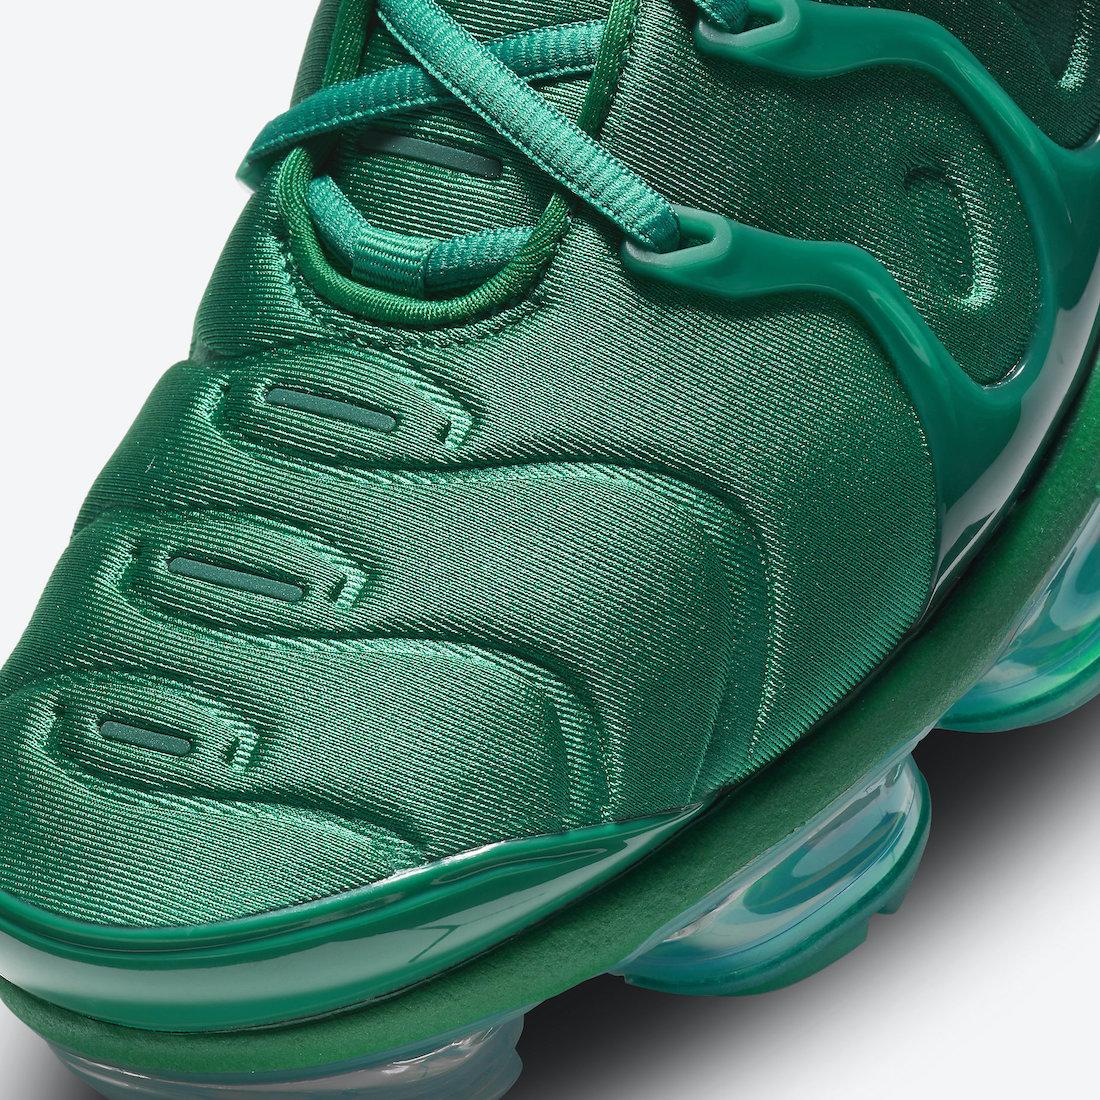 Nike Air VaporMax Plus Atlanta DH0145-300 Release Date Info